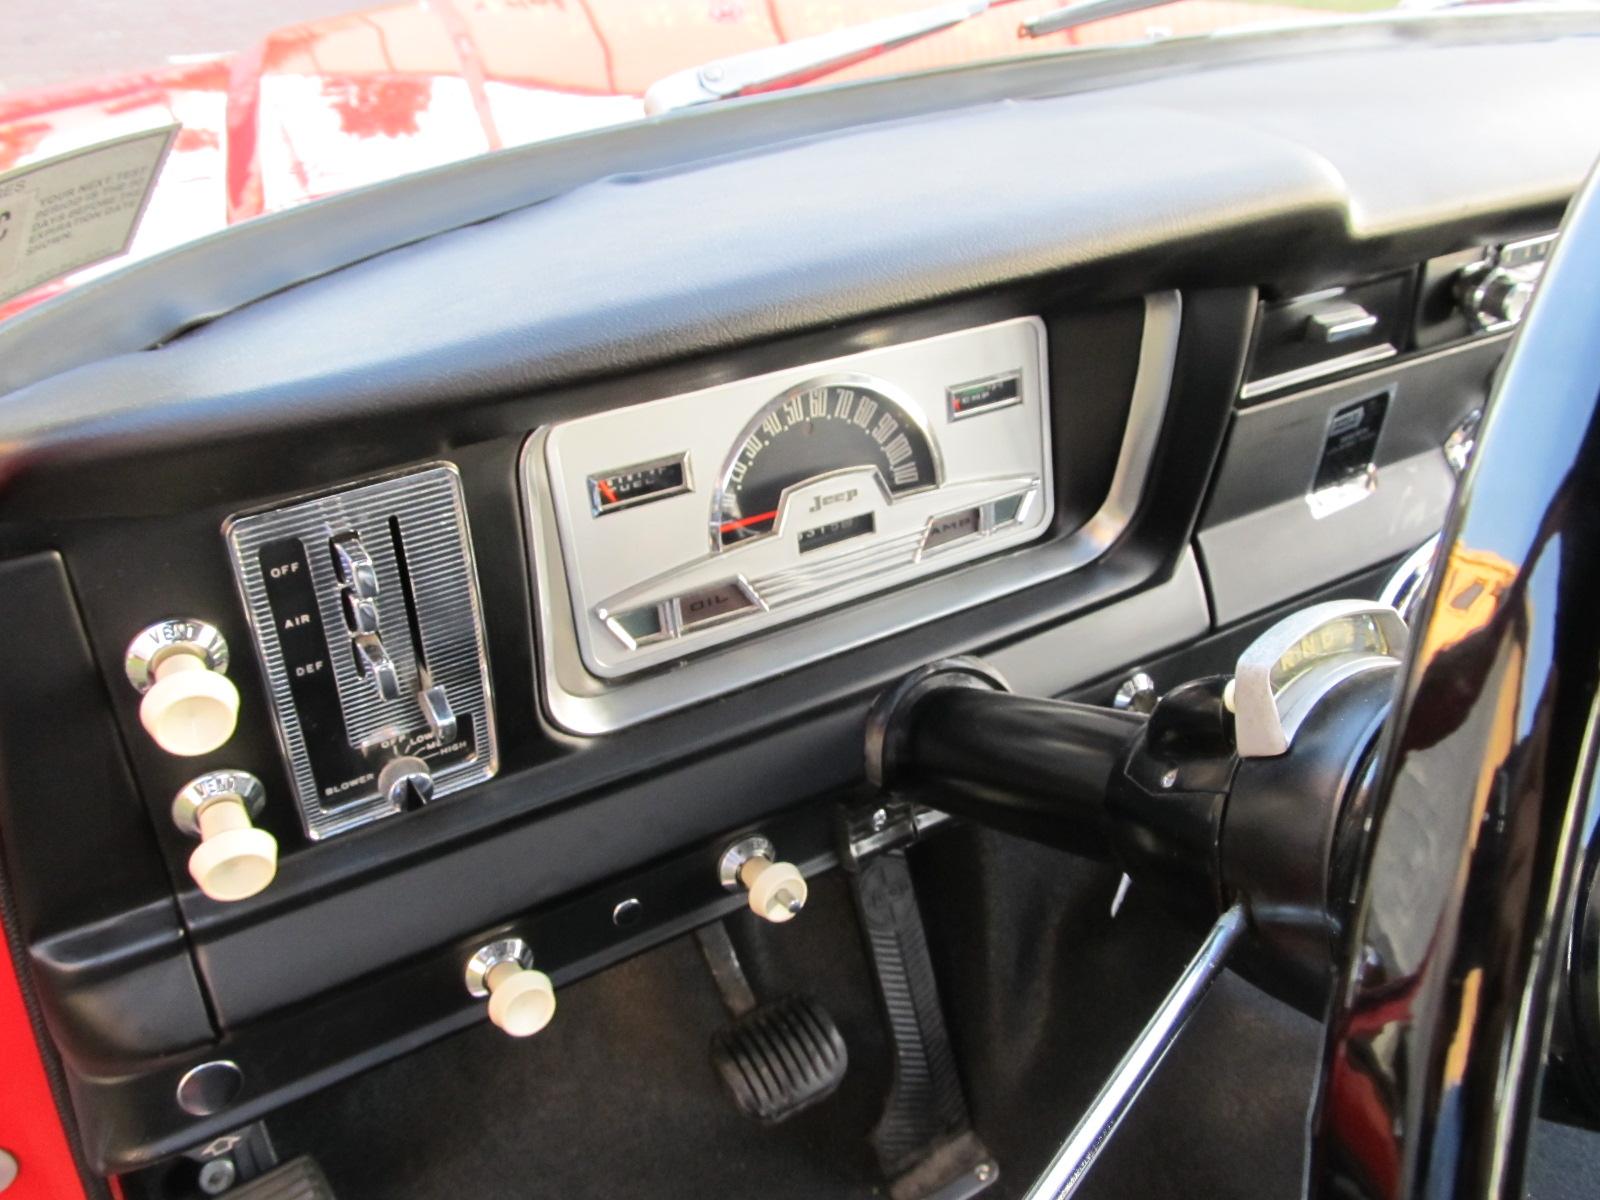 Build A Jeep >> 1968 Jeep Wagoneer - SOLD! - Vantage Sports Cars | Vantage ...